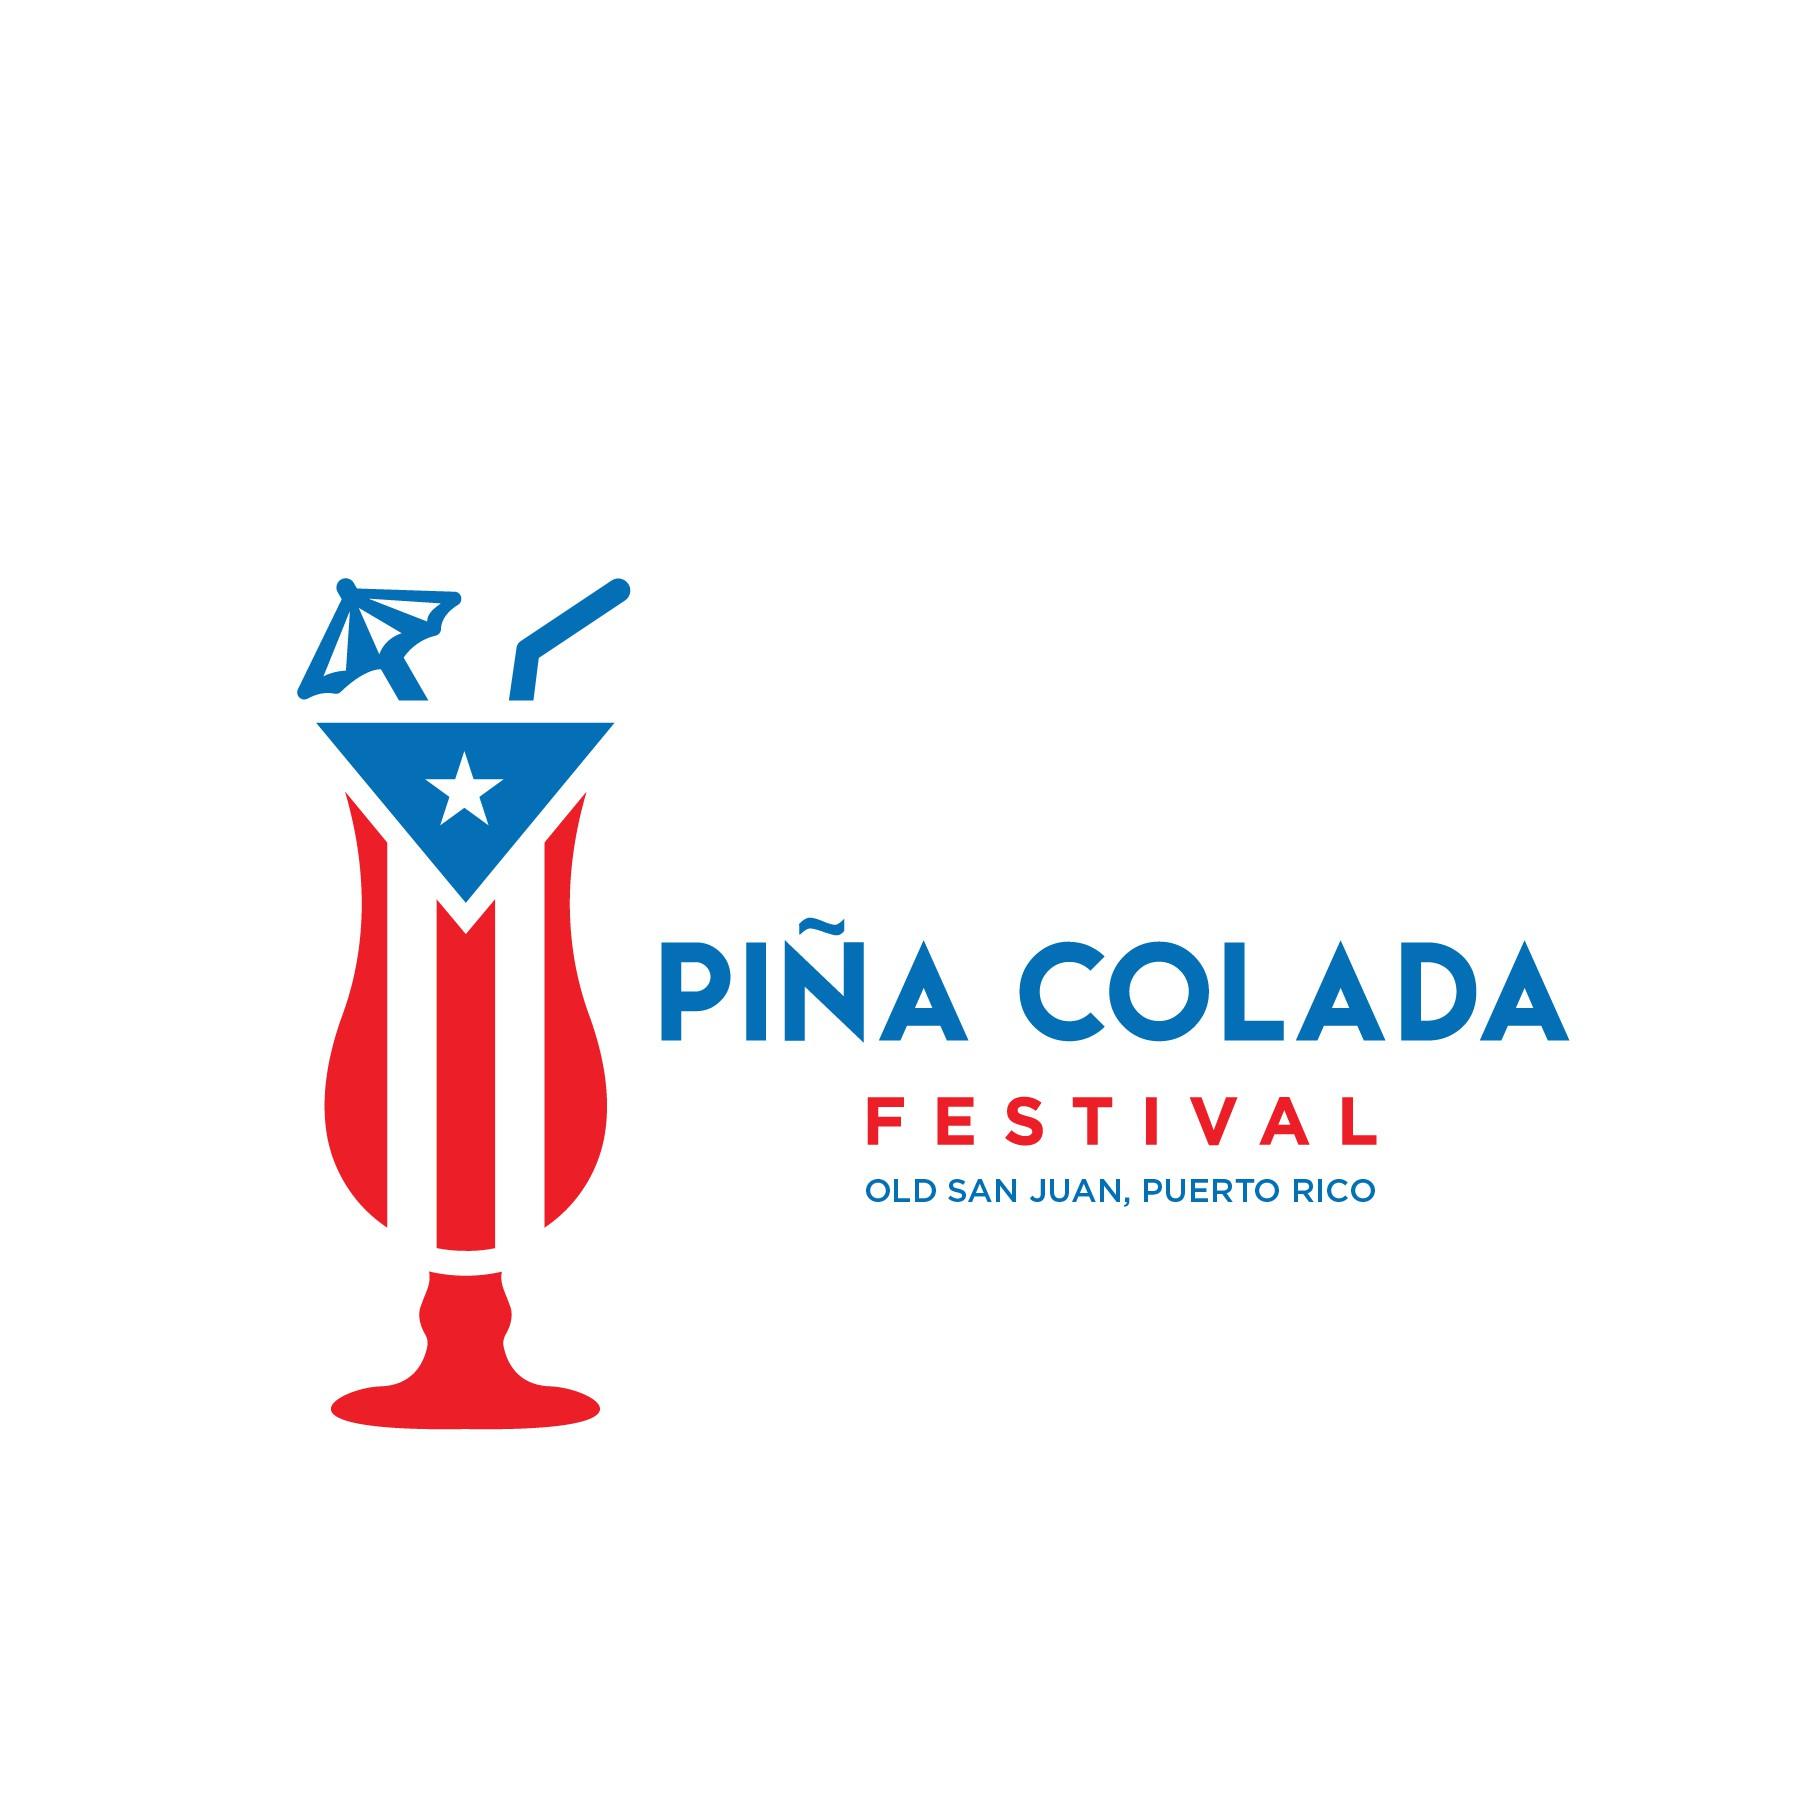 Piña Colada Festival Logo and Branding Package